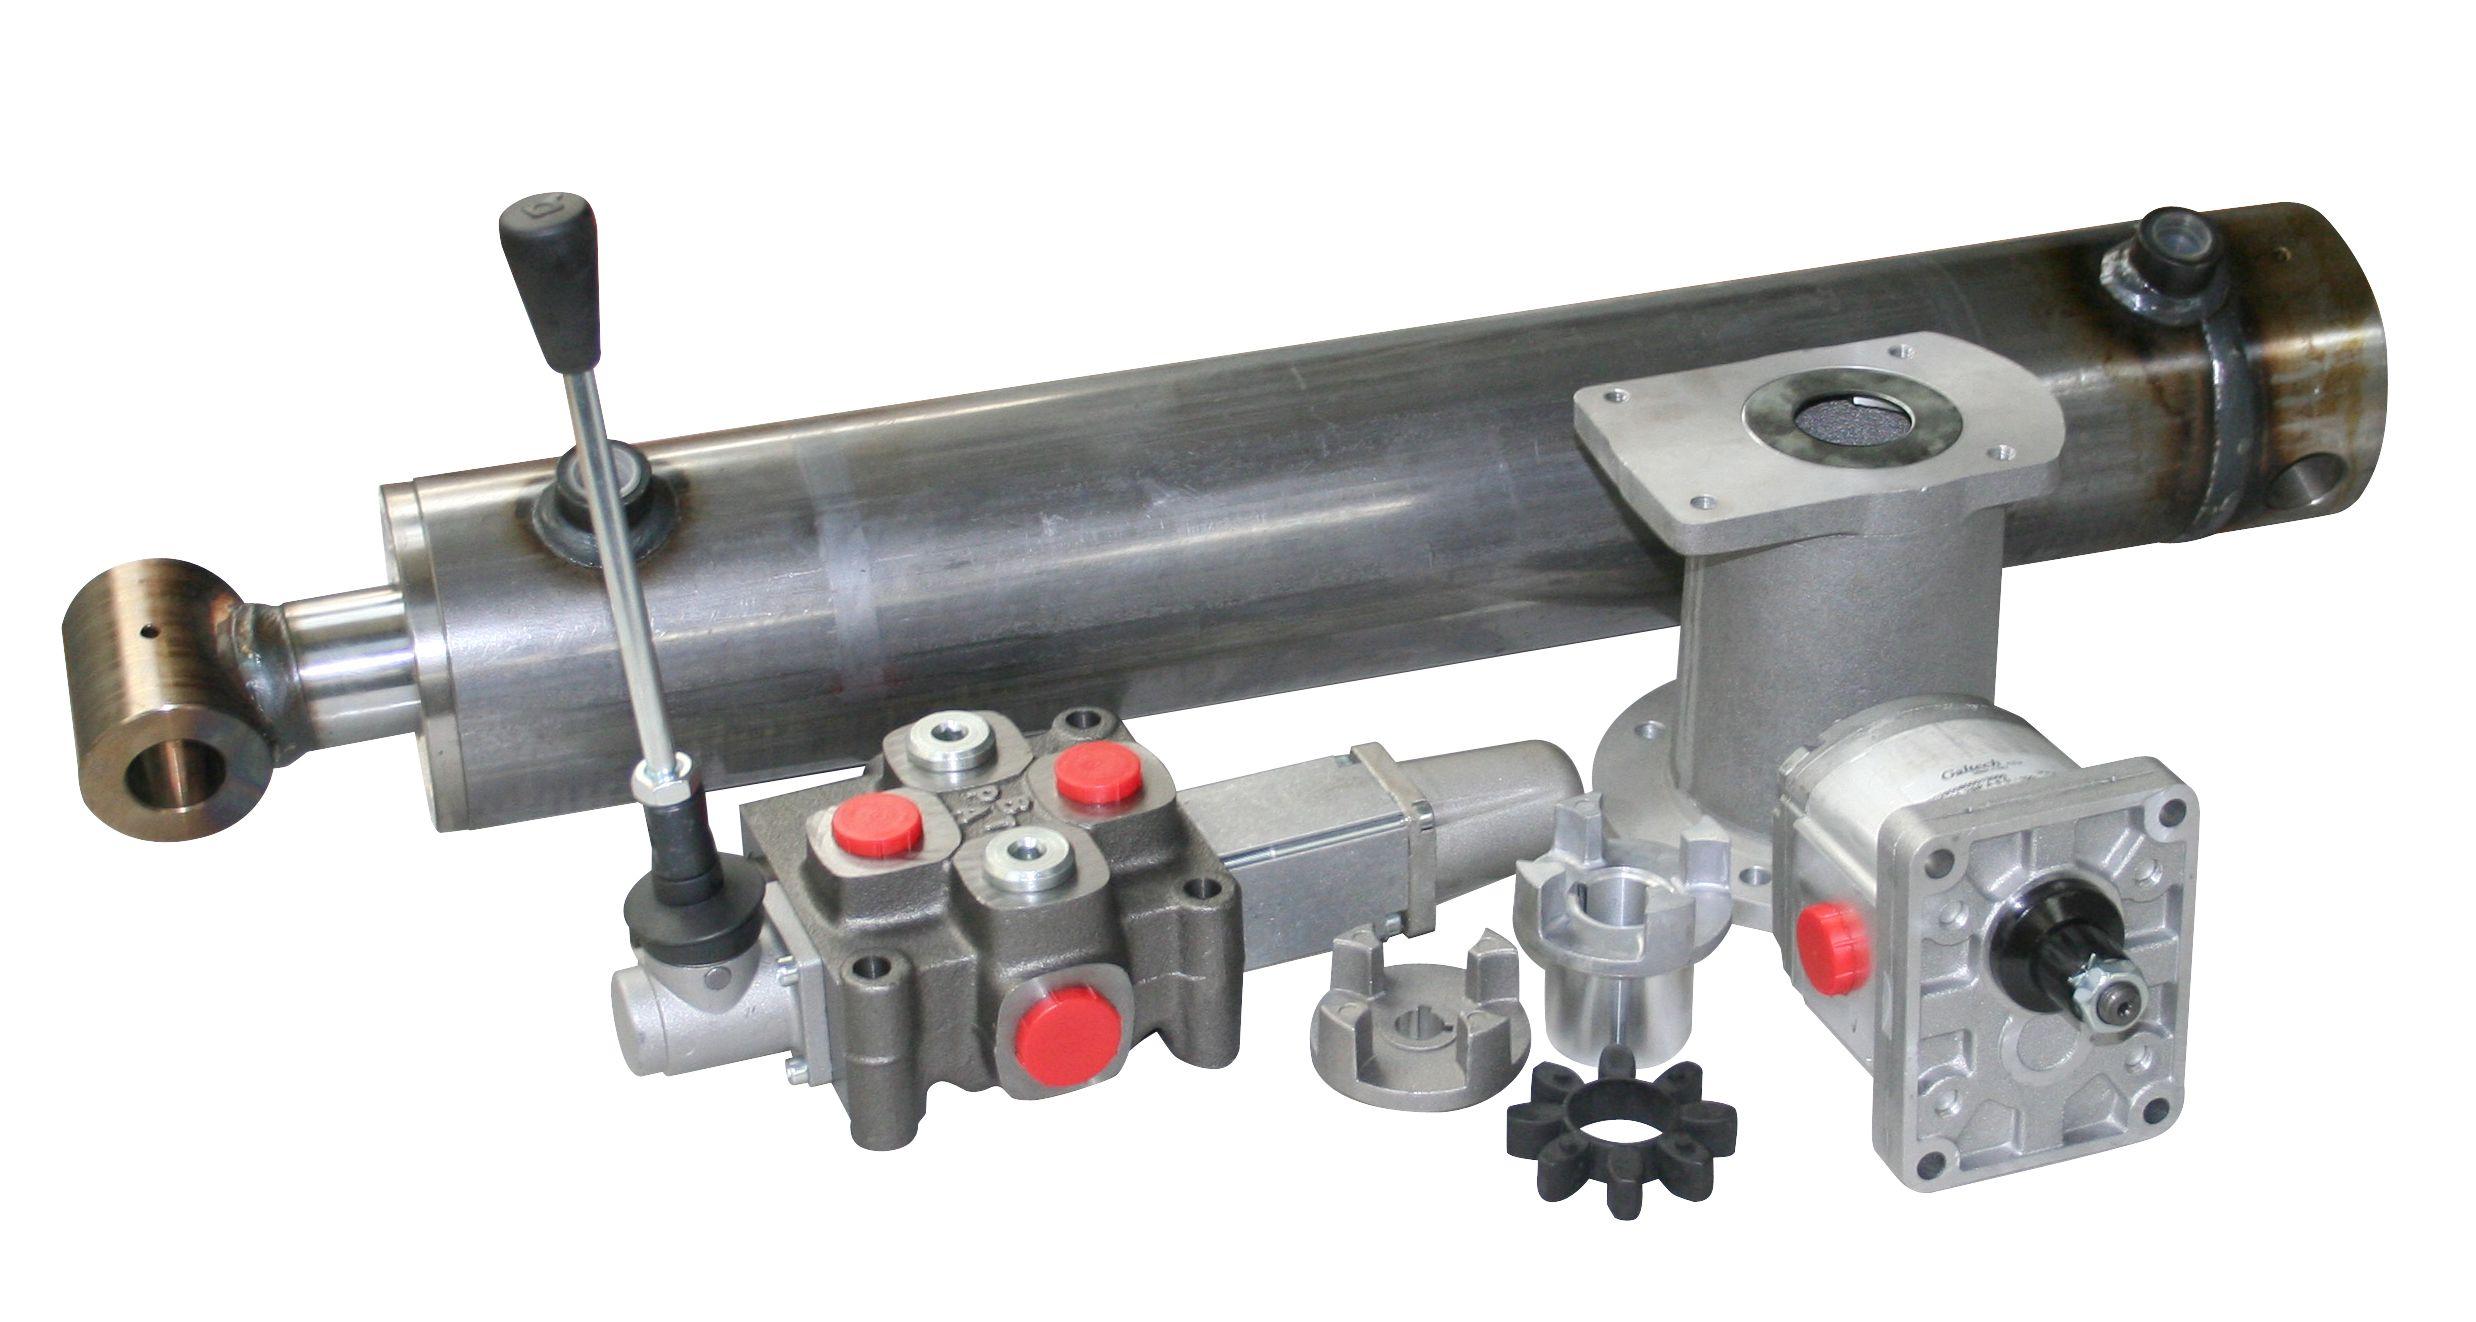 Hydraulic Log Splitter Repair Droughtrelief Org